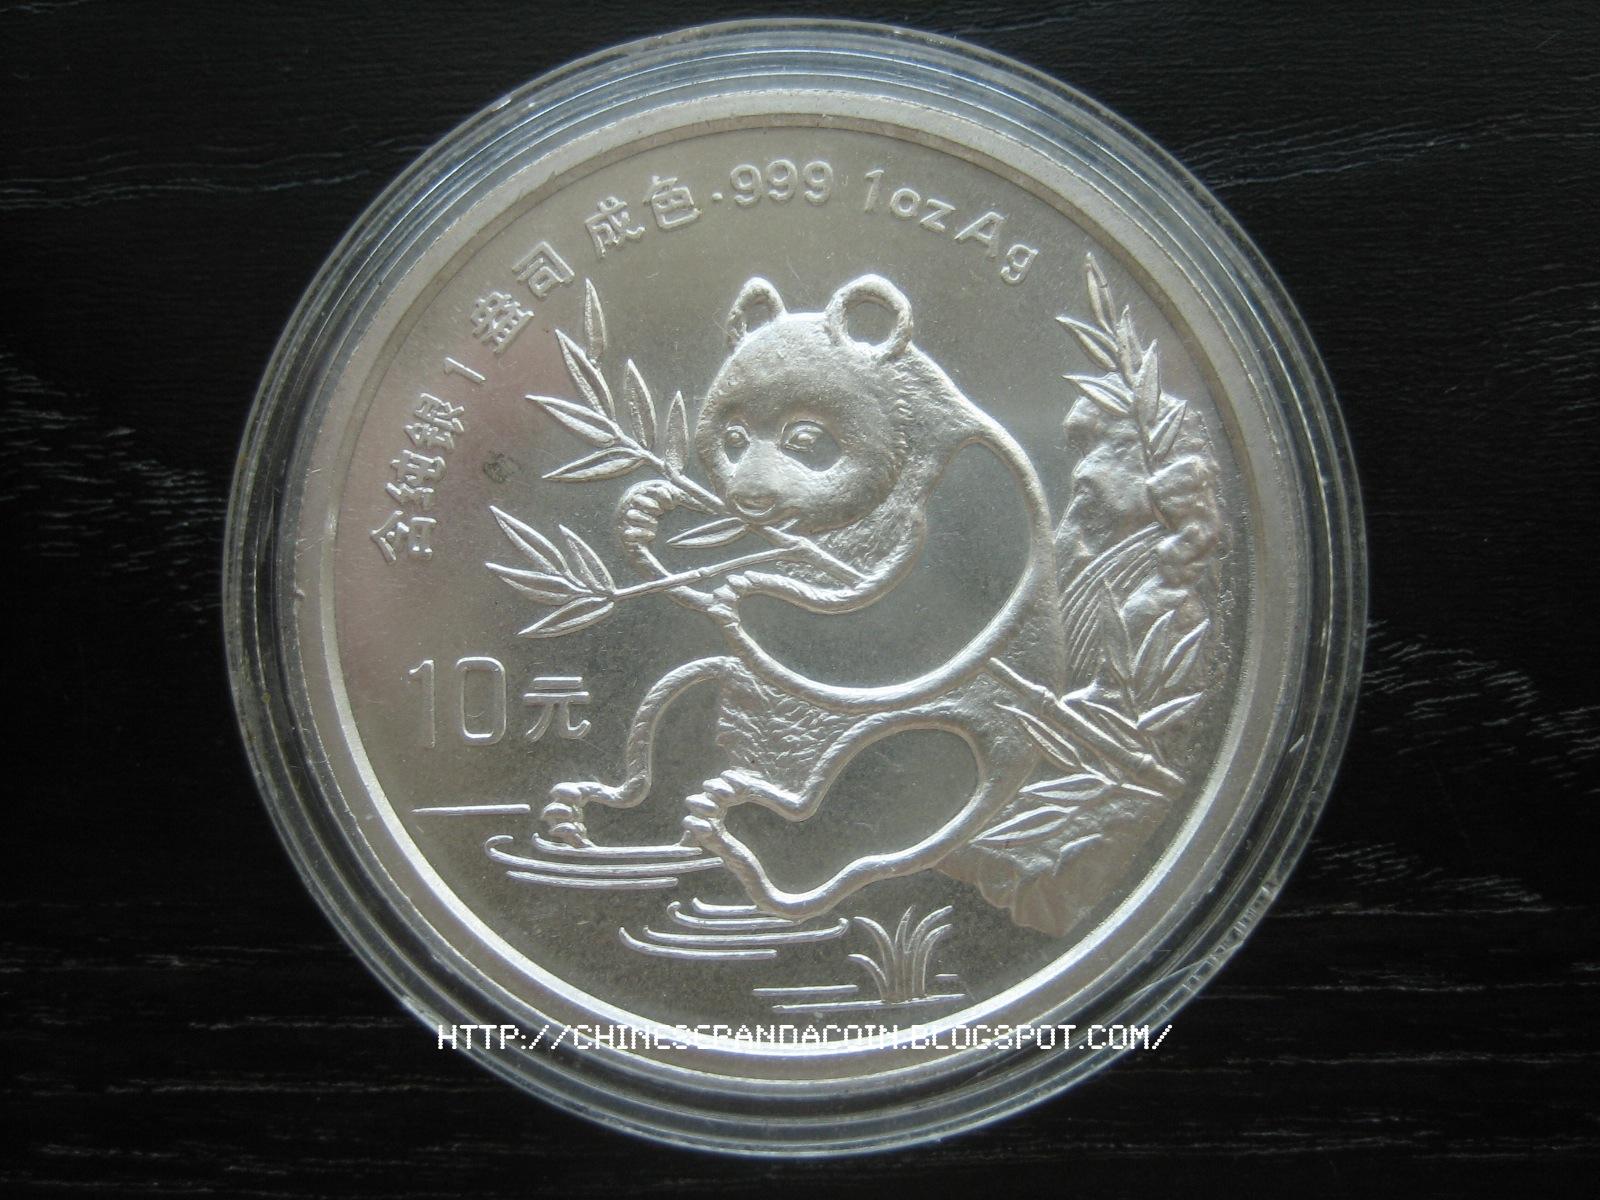 Chinese Panda Coin 1991 Chinese Silver Panda